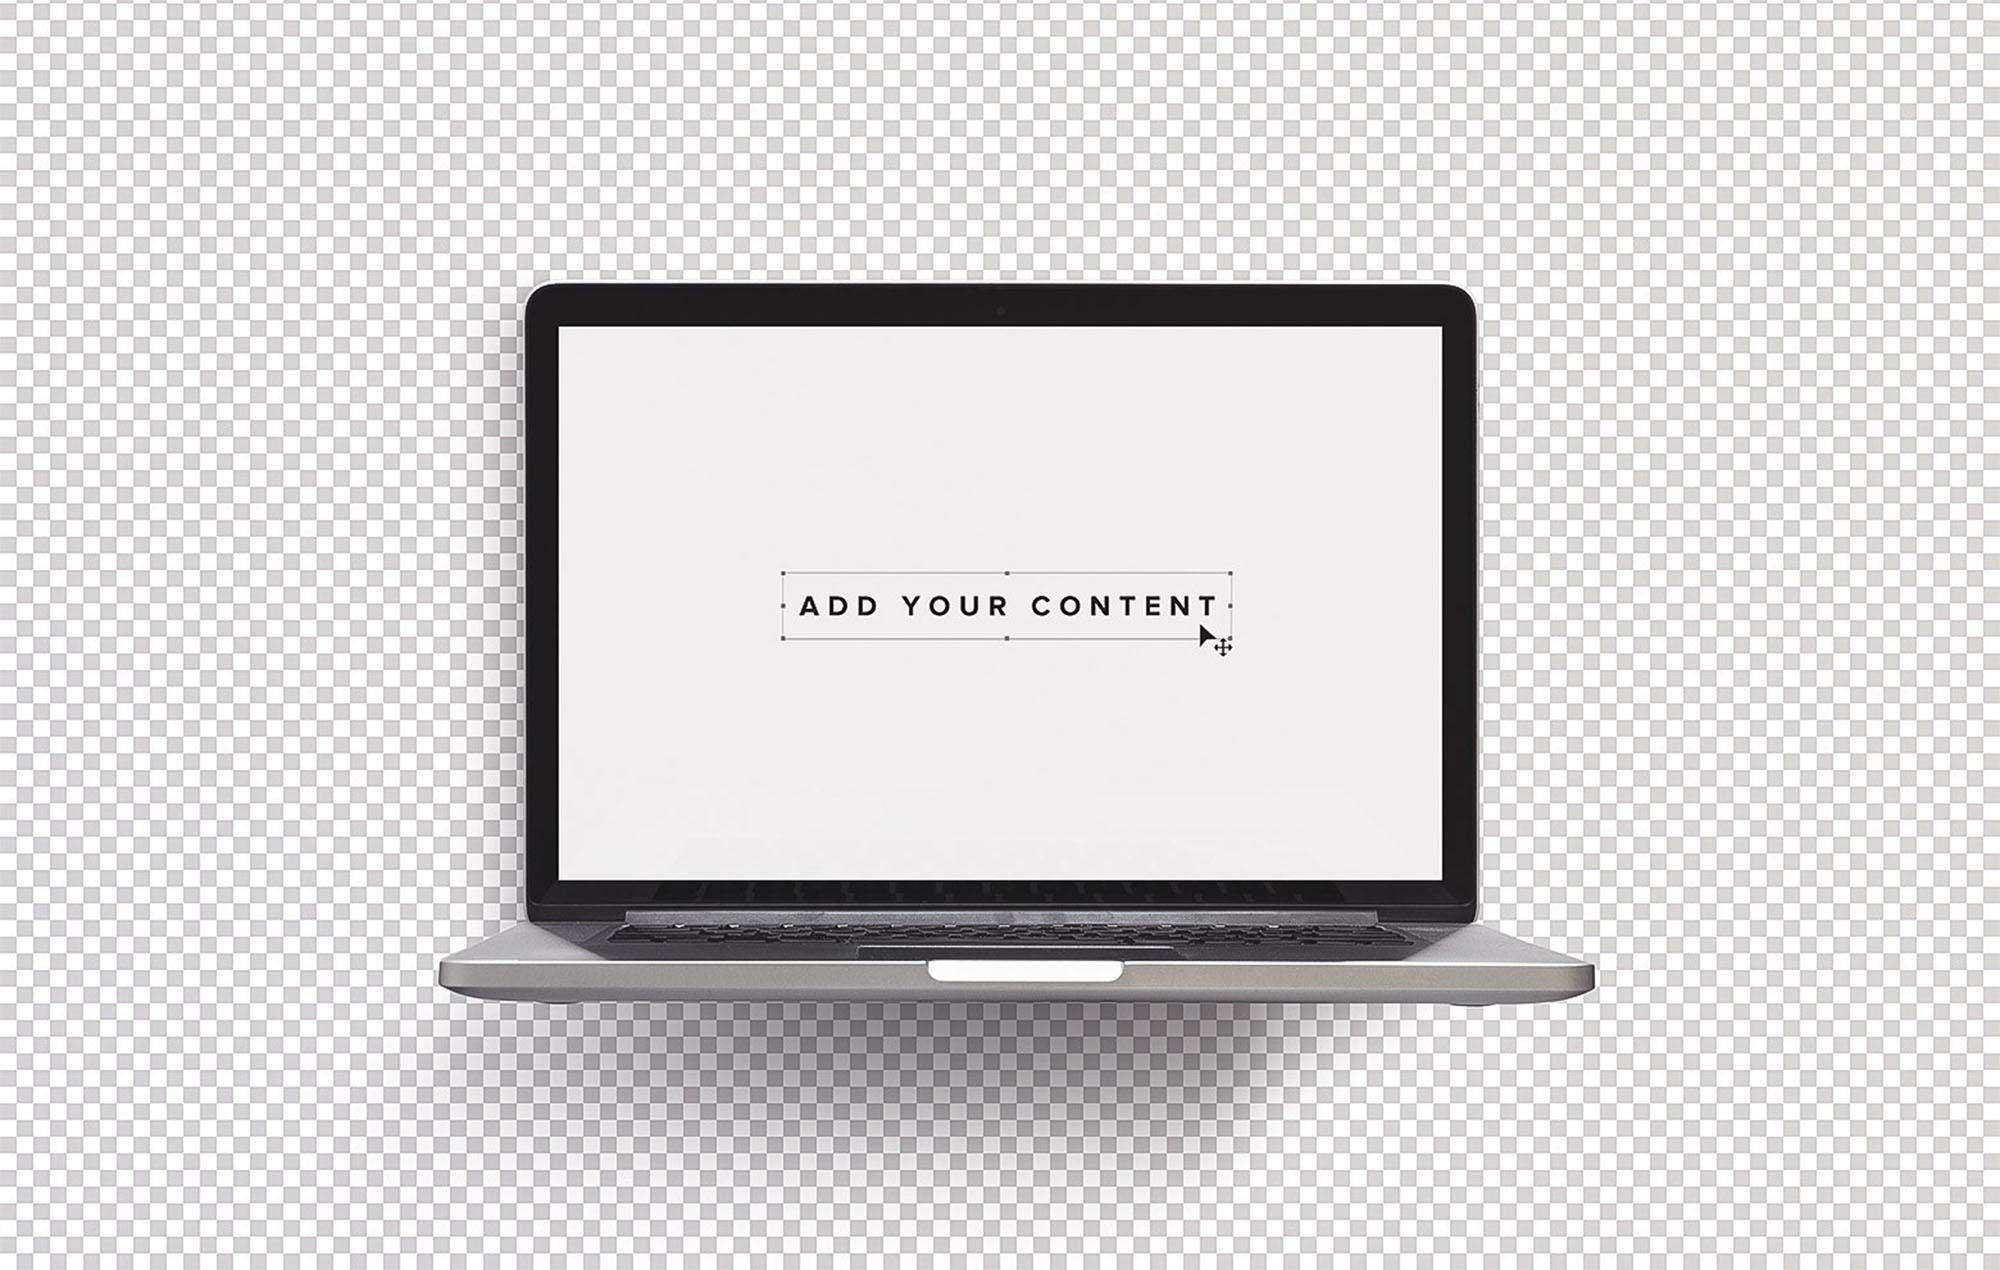 Free Macbook Pro Laptop Mockup (PSD)